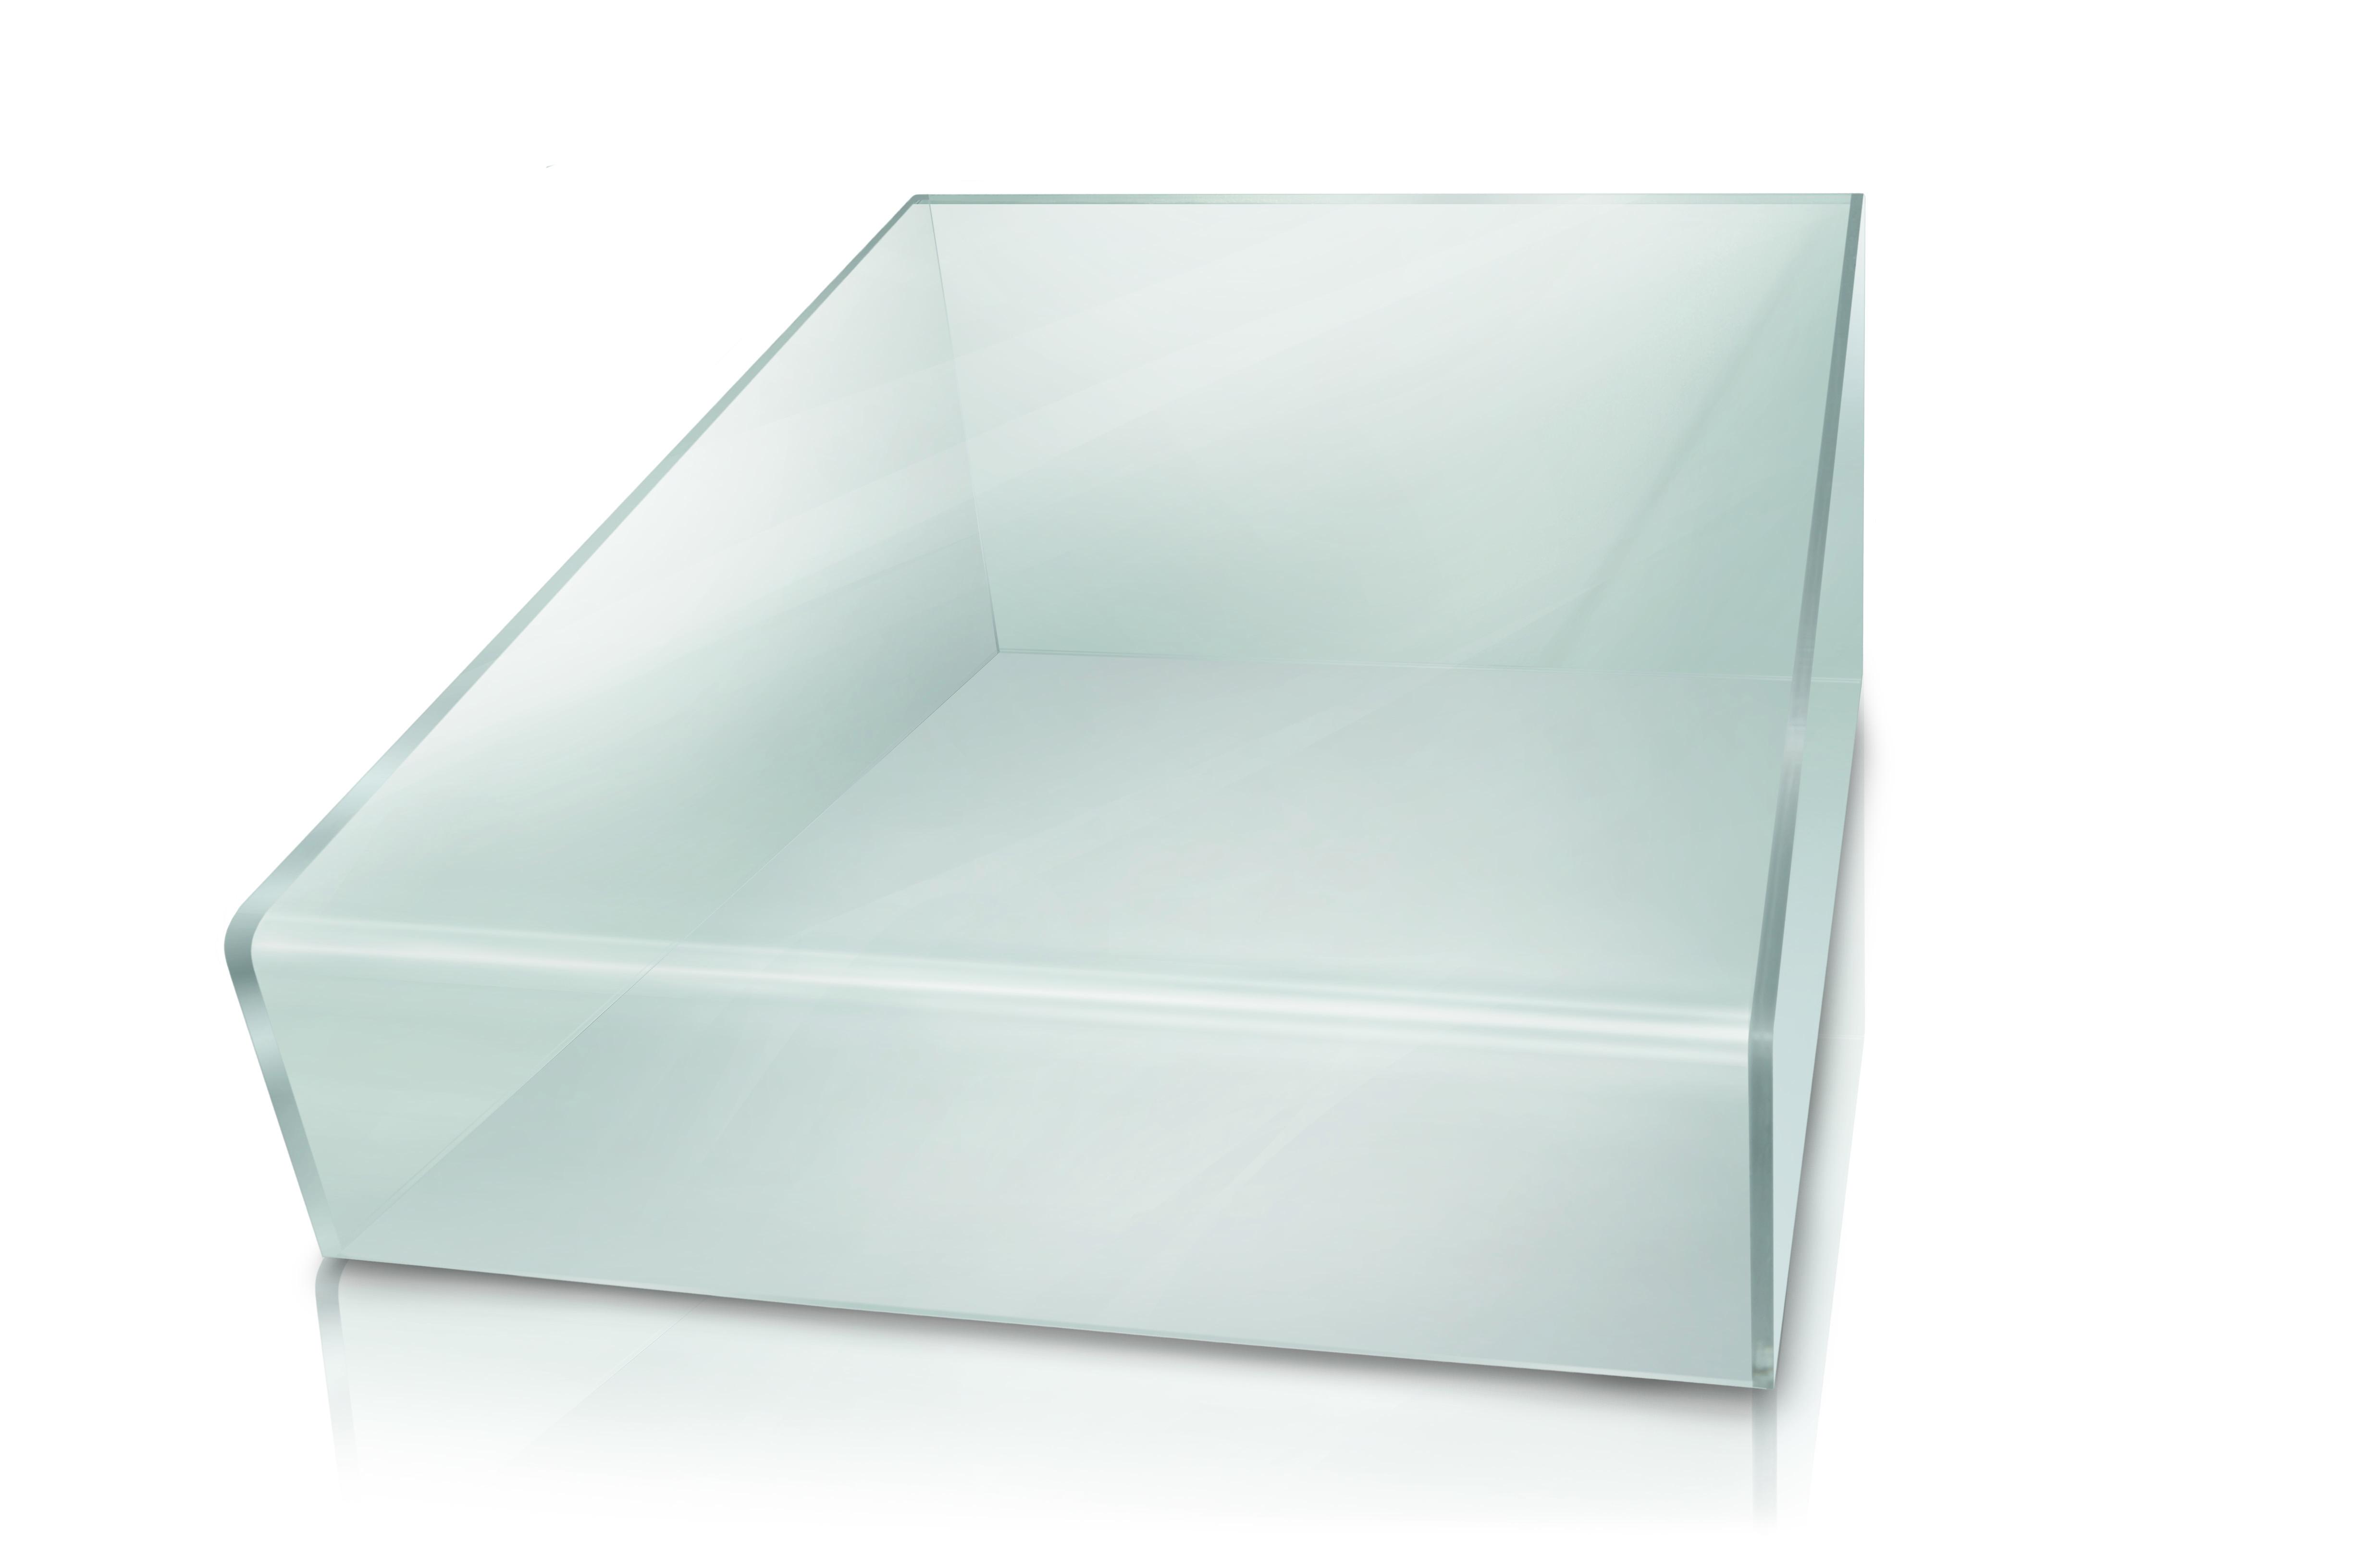 ACS Dewing test chamber plexiglass cover